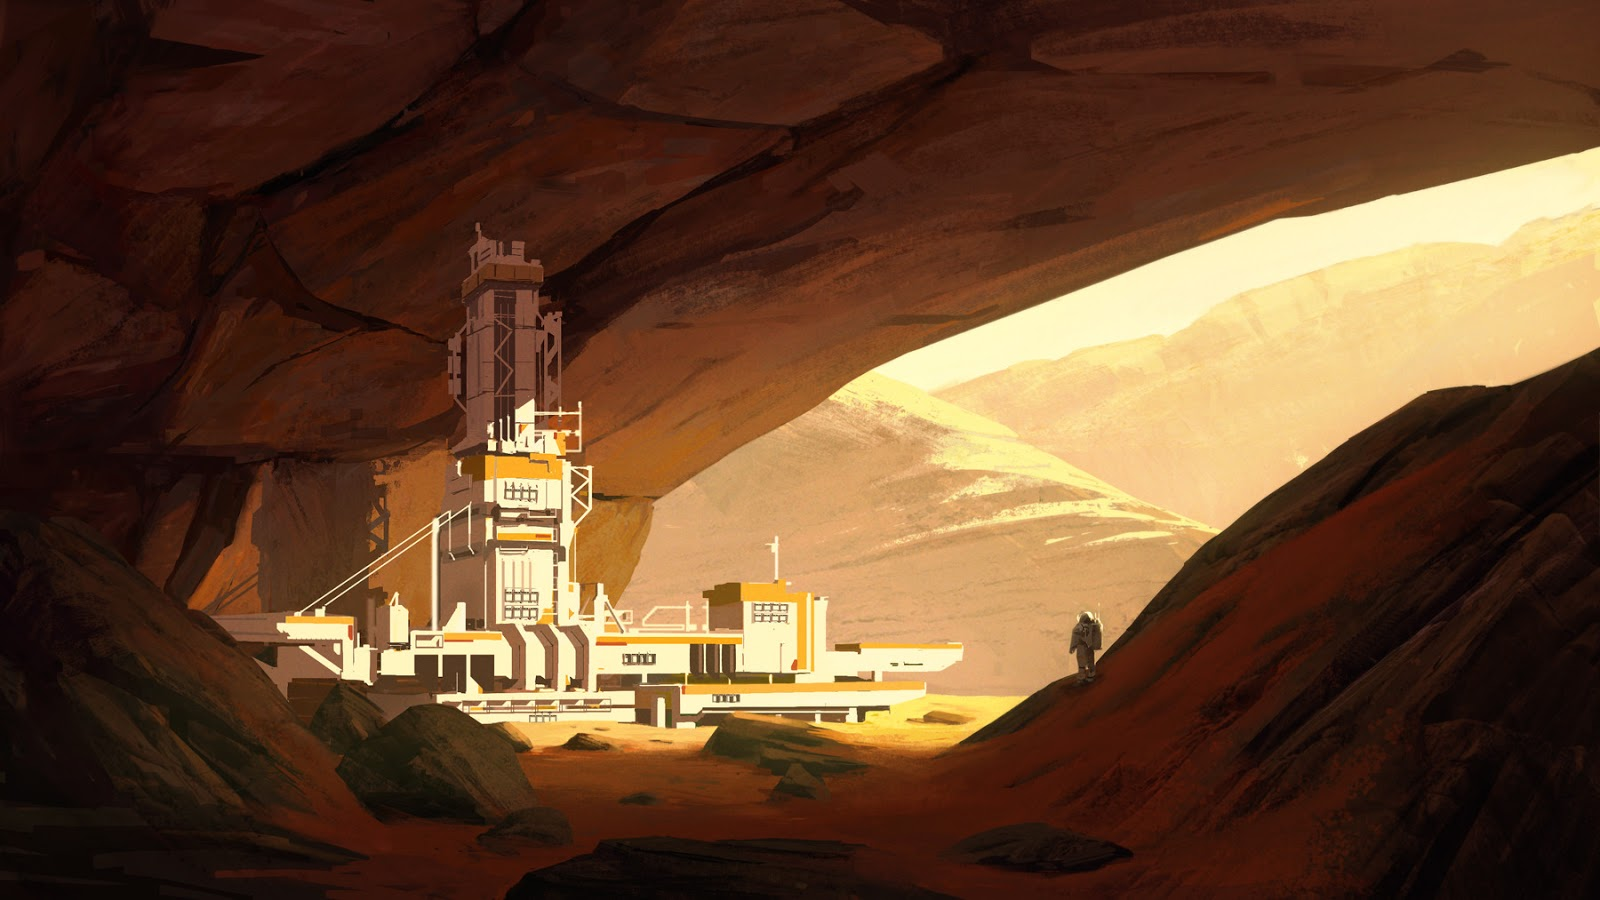 Human base in Martian cave by Natalia Babiy